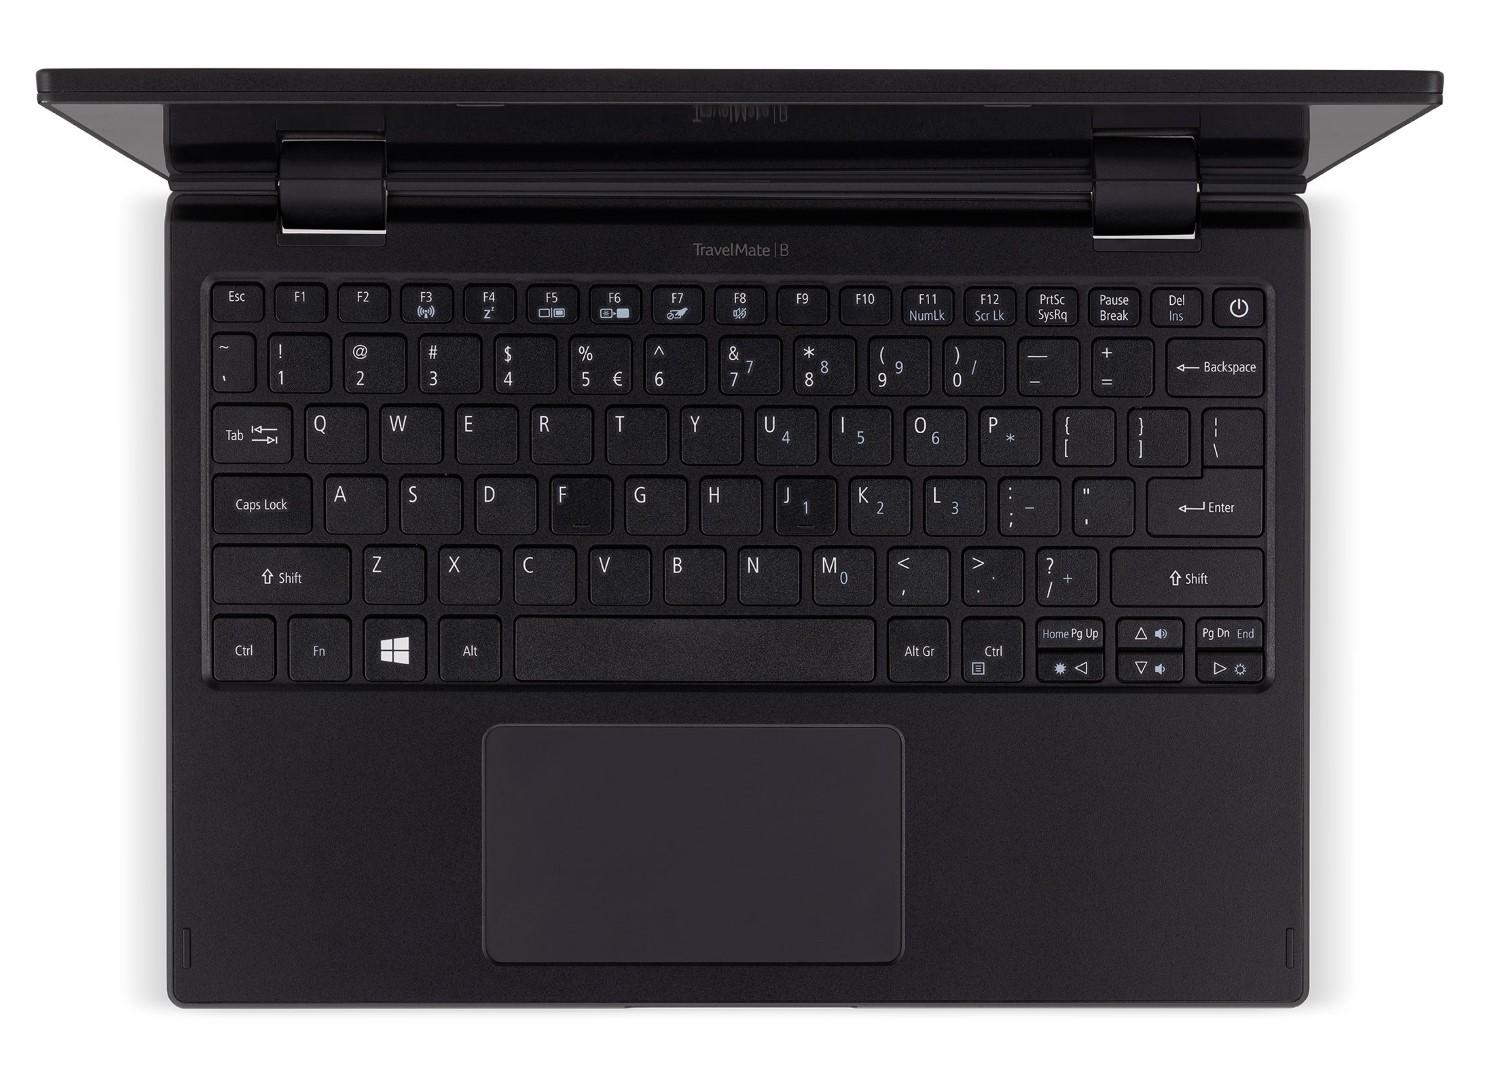 [Image: keyboard.jpg]